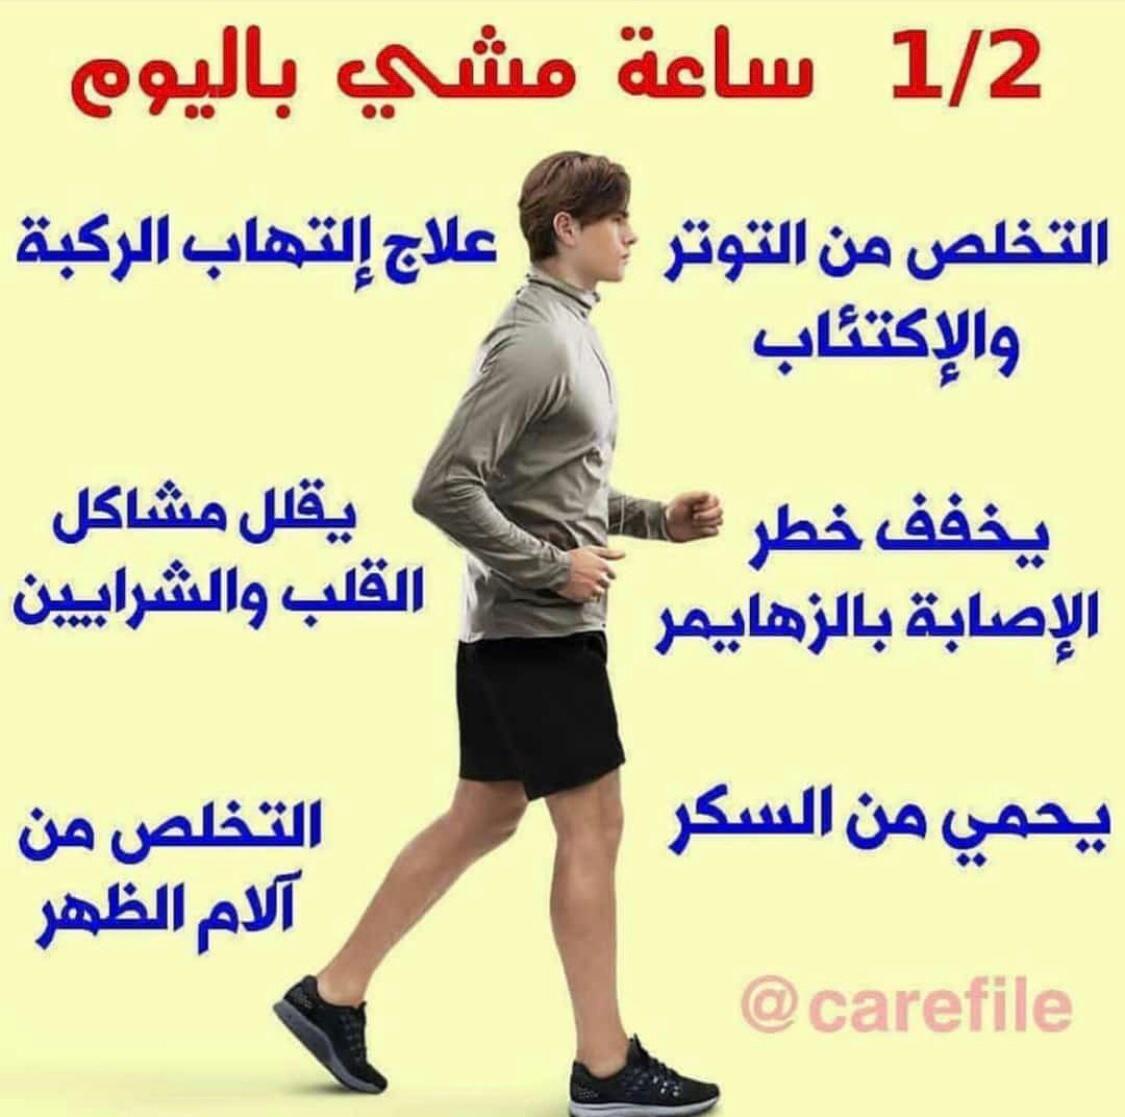 Pin by Asssuwaidi on النظام الغذائى Exercise, Sports